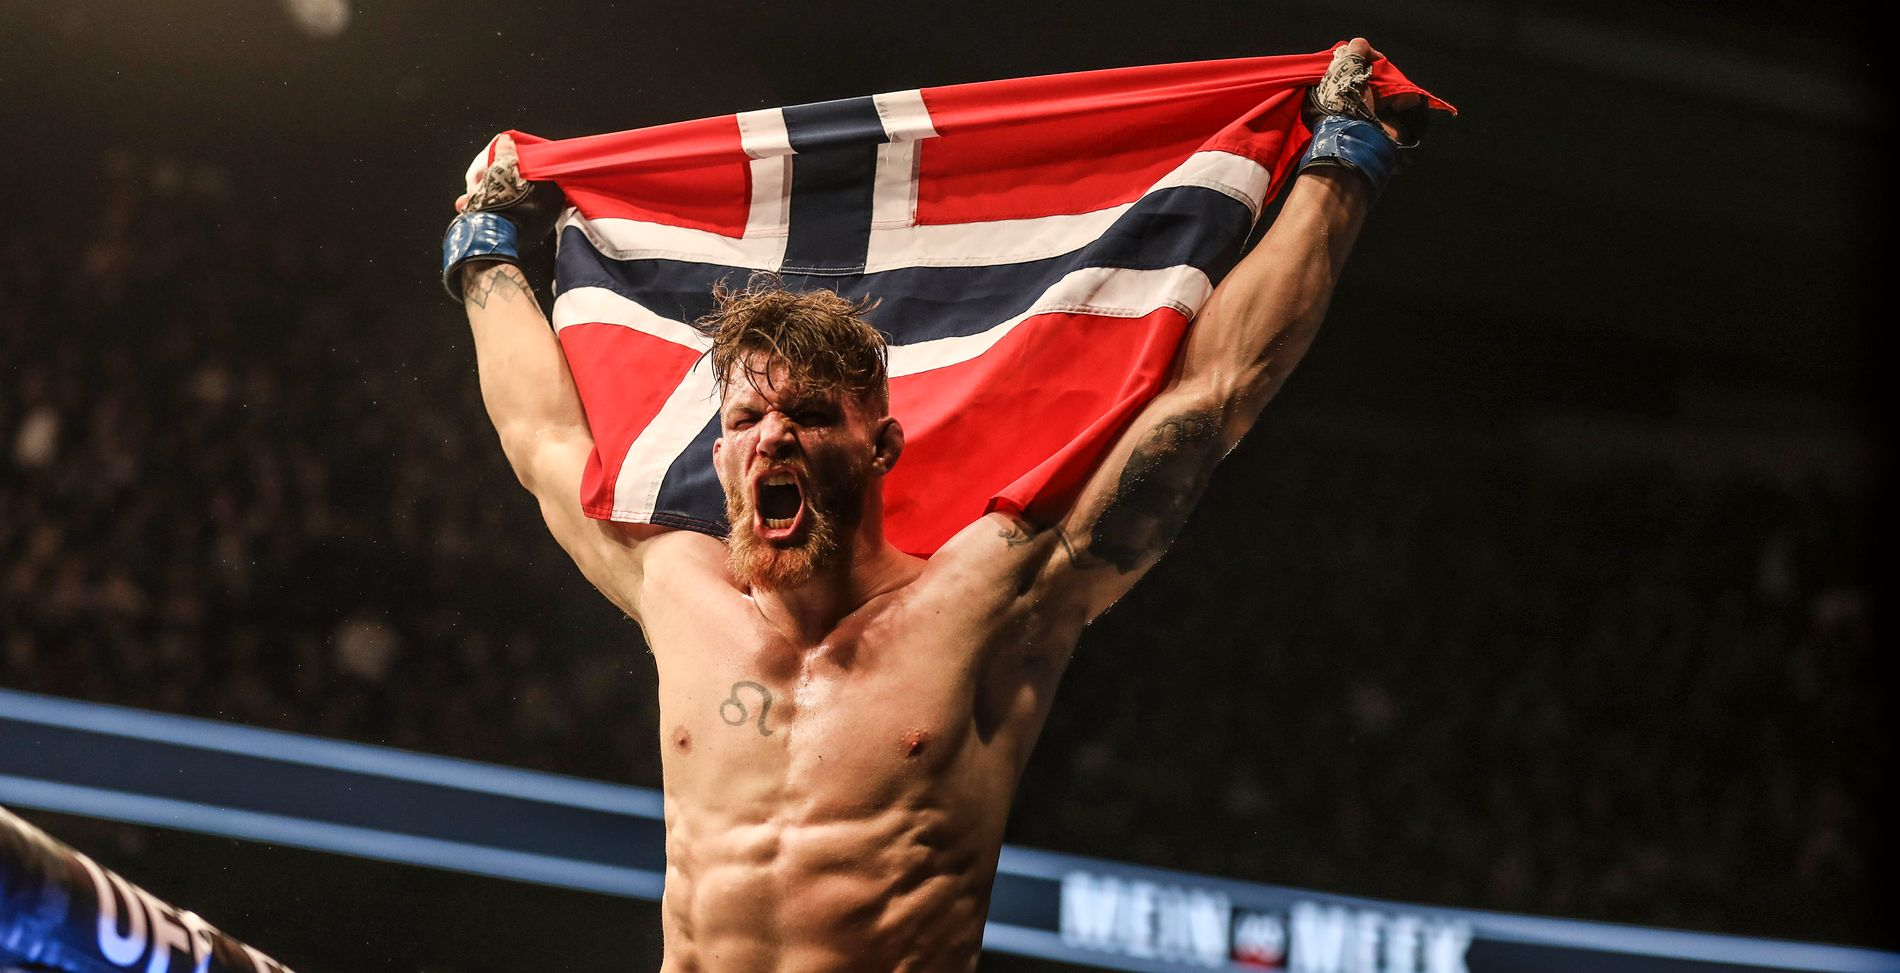 SEIRET: Emil Meek løftet det norske flagget og slapp jubelen løs etter kampen i Air Canada Centre.